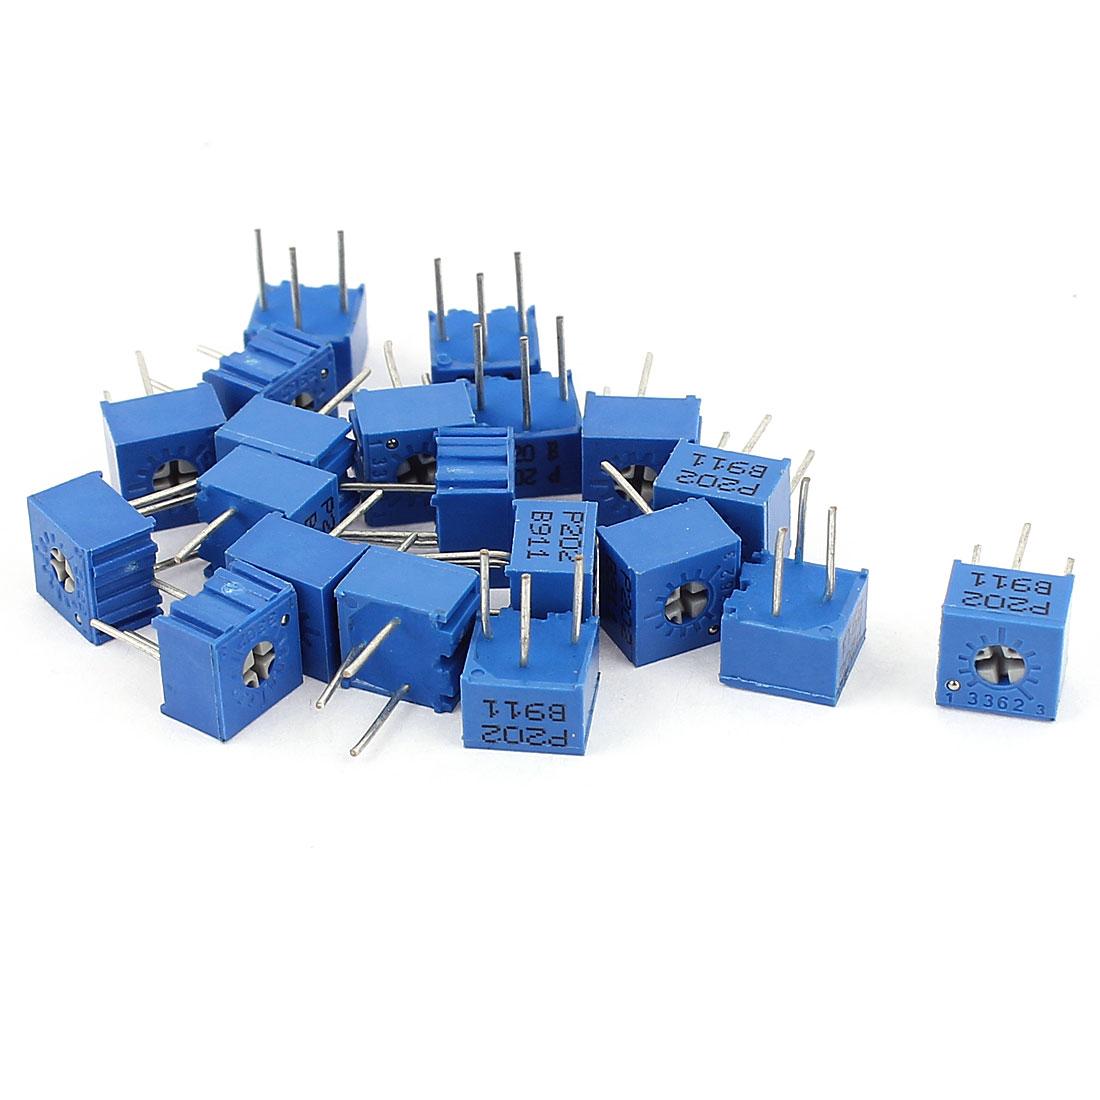 20Pcs Potentiometer Trimmer Variable Resistor 3362P-202 3362P-203